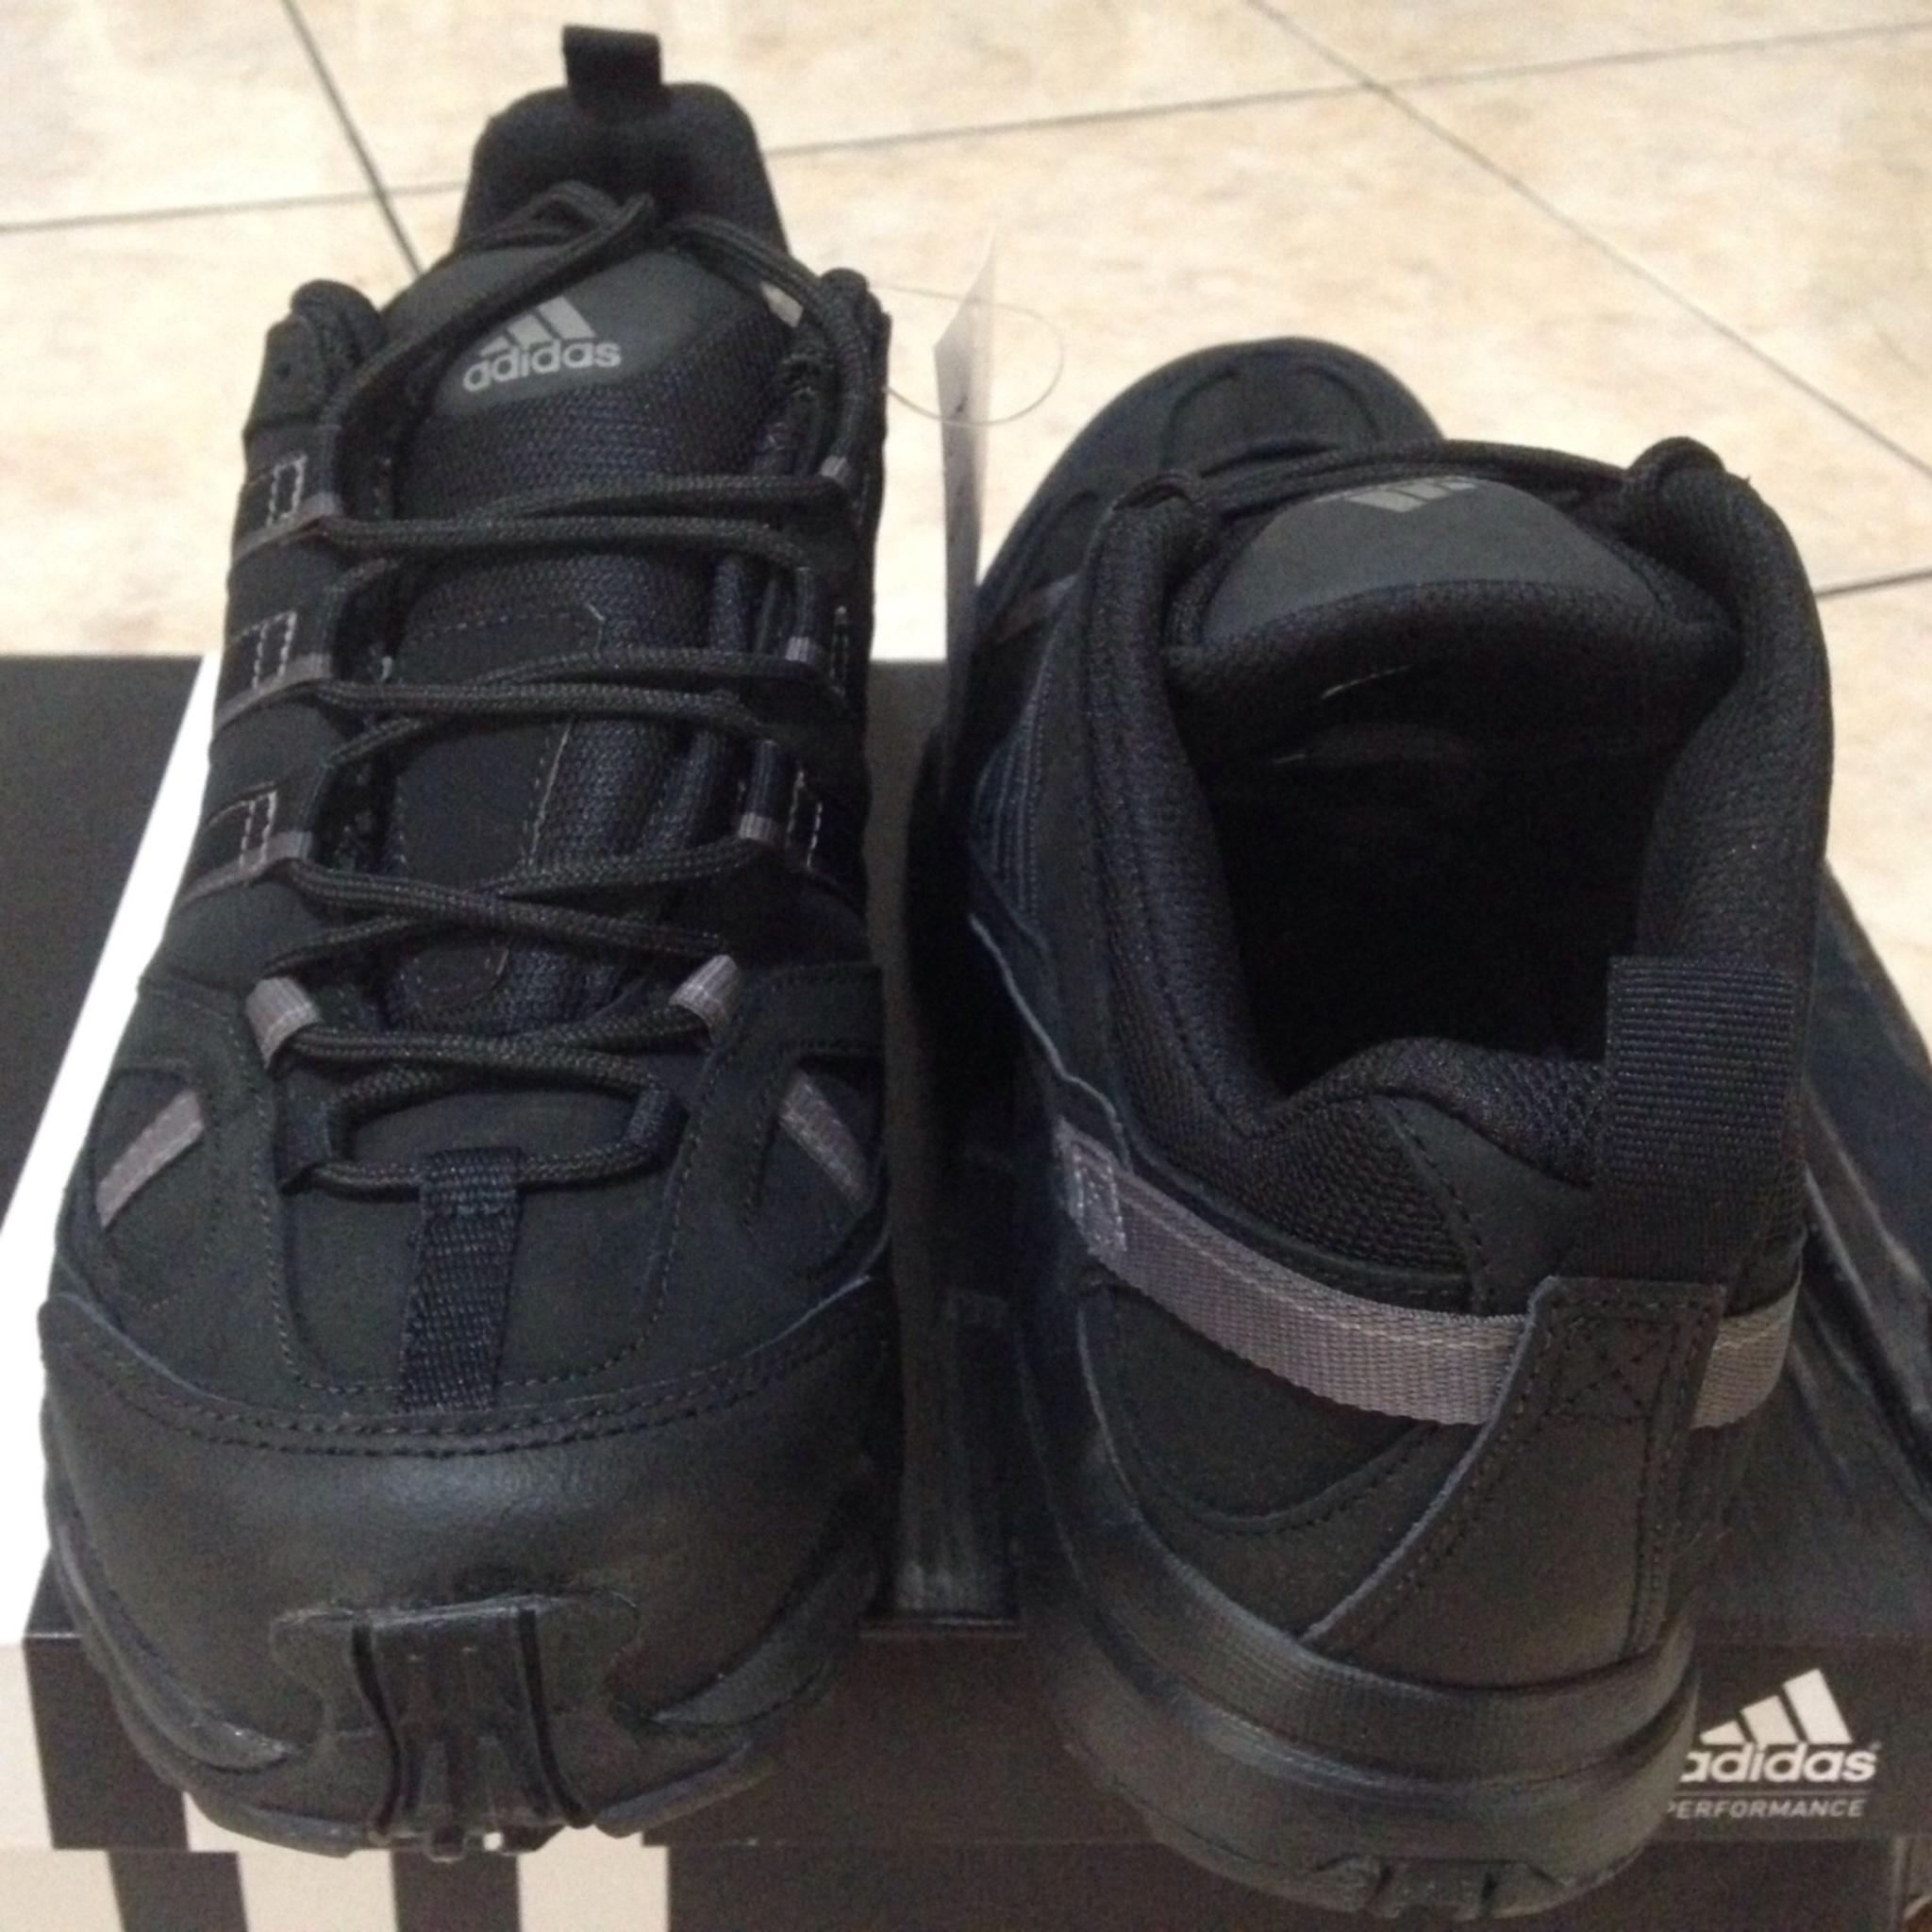 Jual Adidas AX1 Lea Hitam Size 44 Sepatu Gunung Outdoor